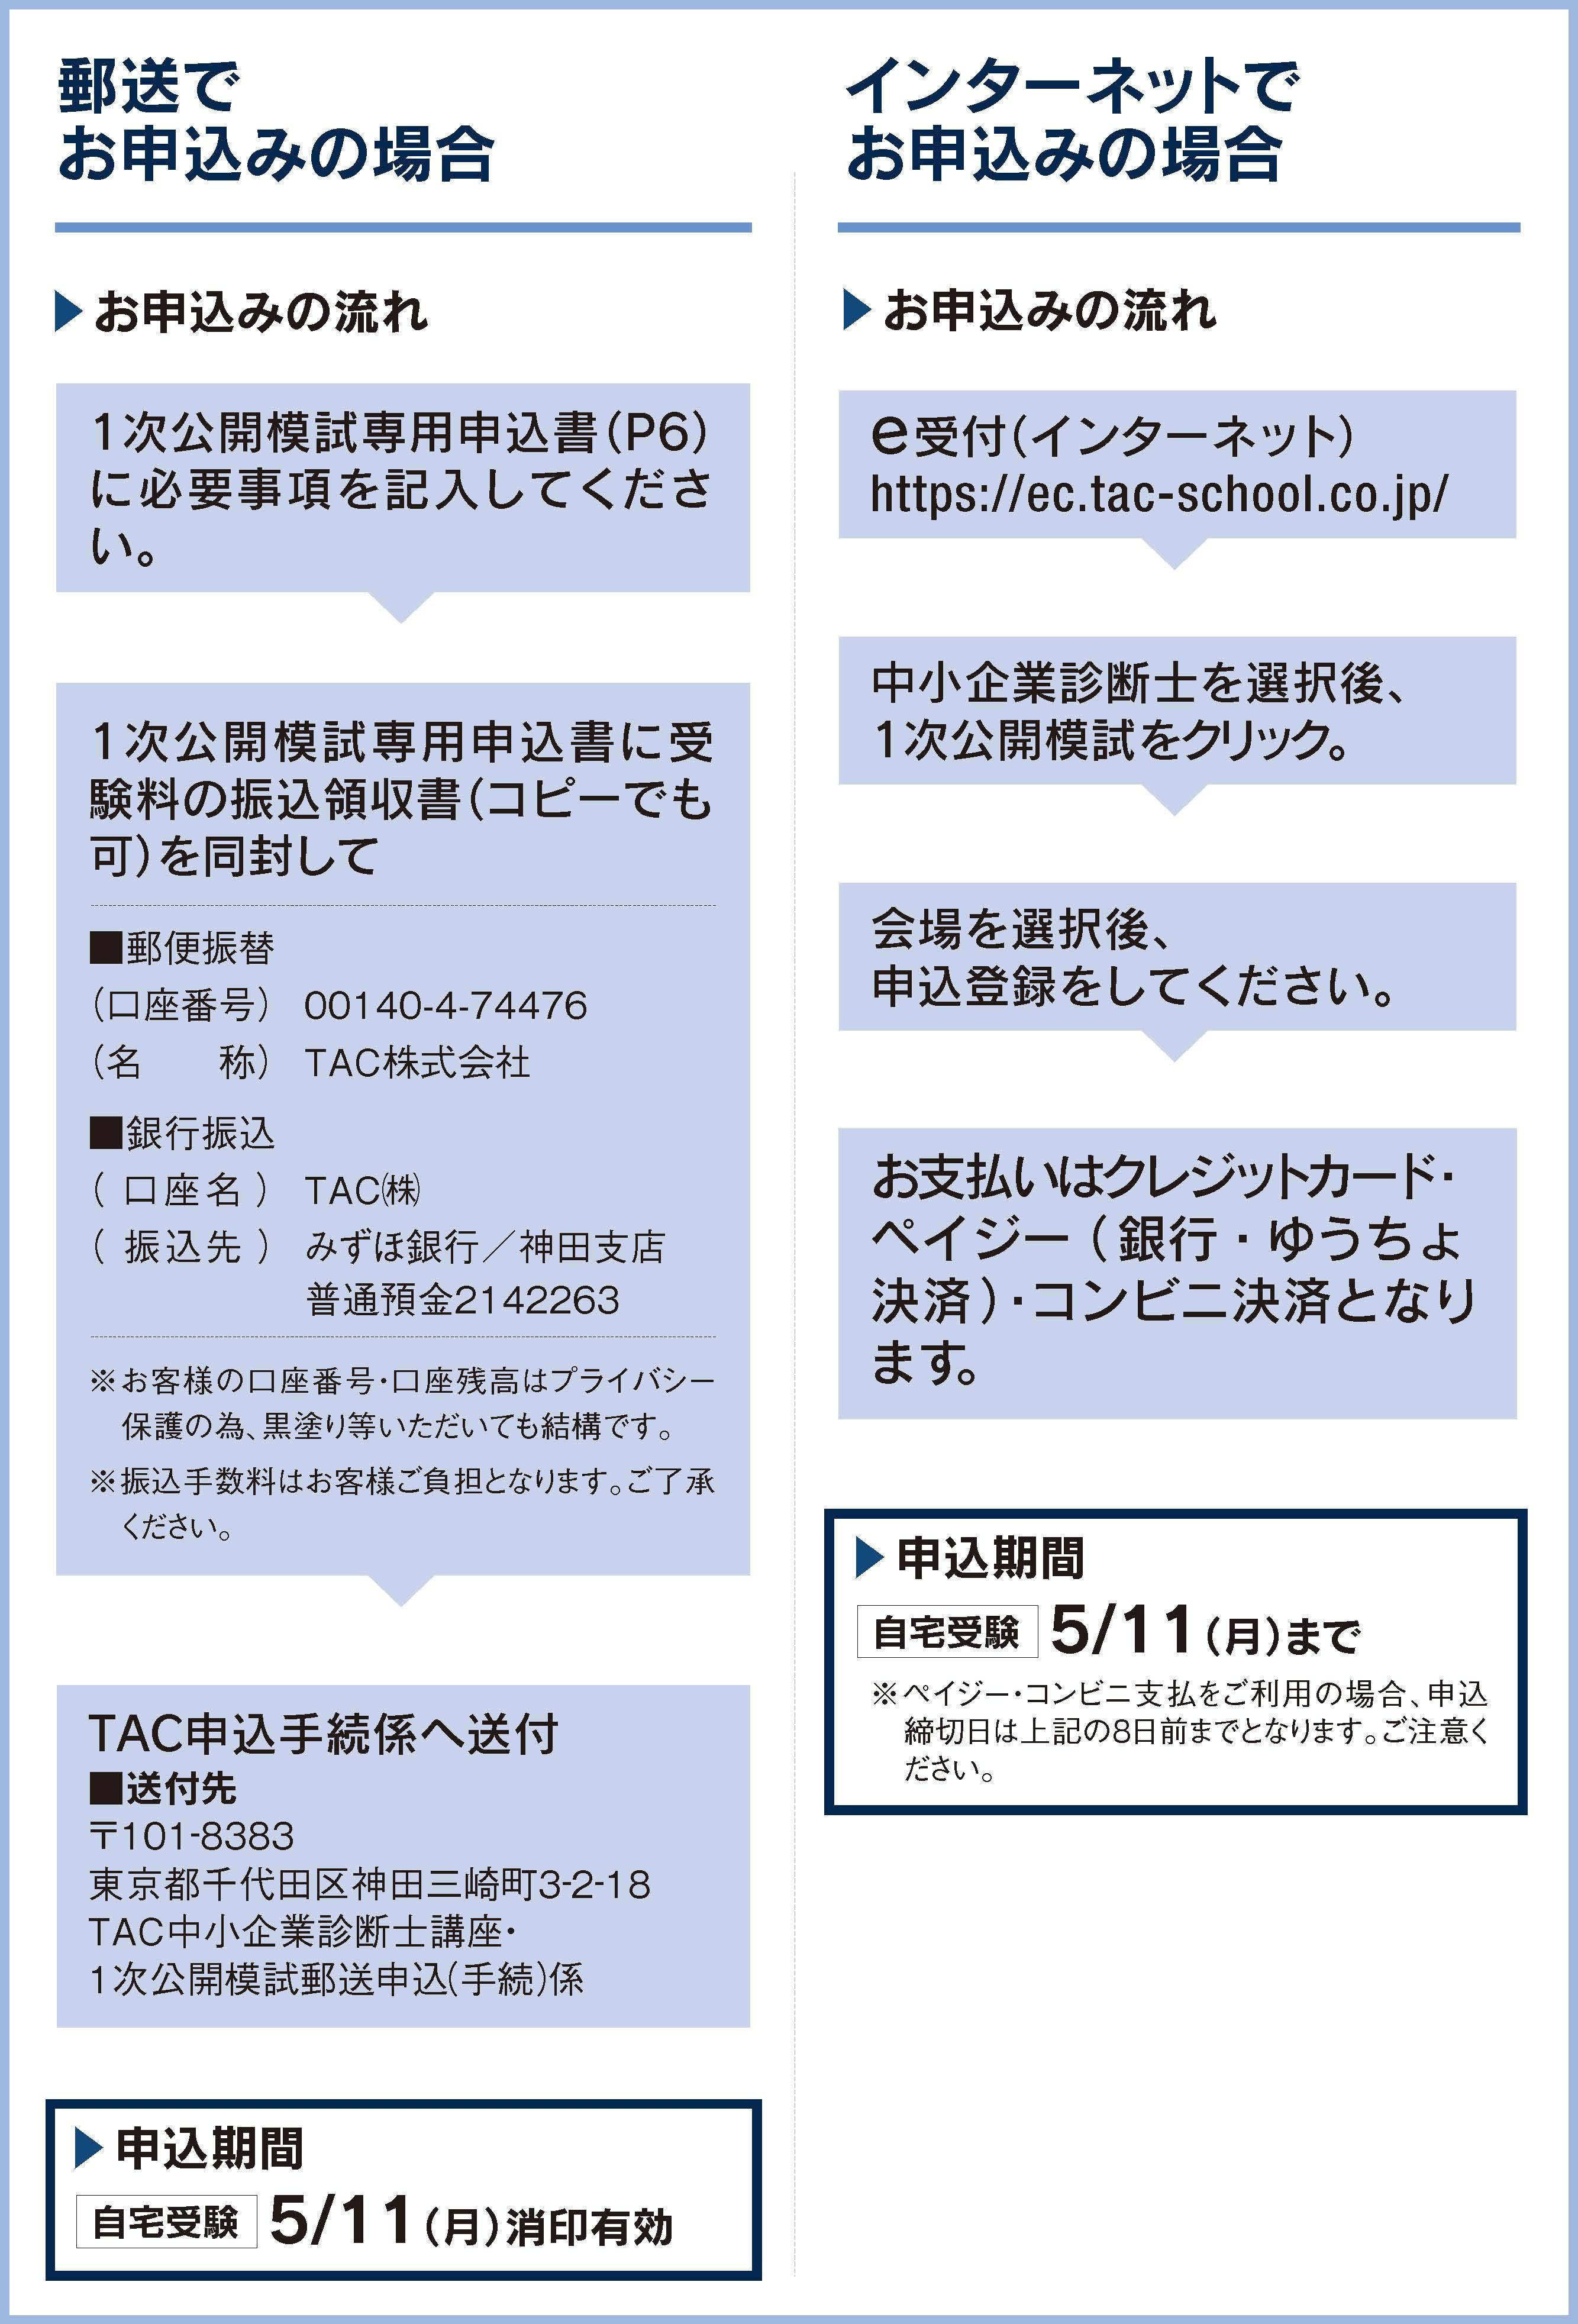 2020_1jimosi_mosikomi02.jpg